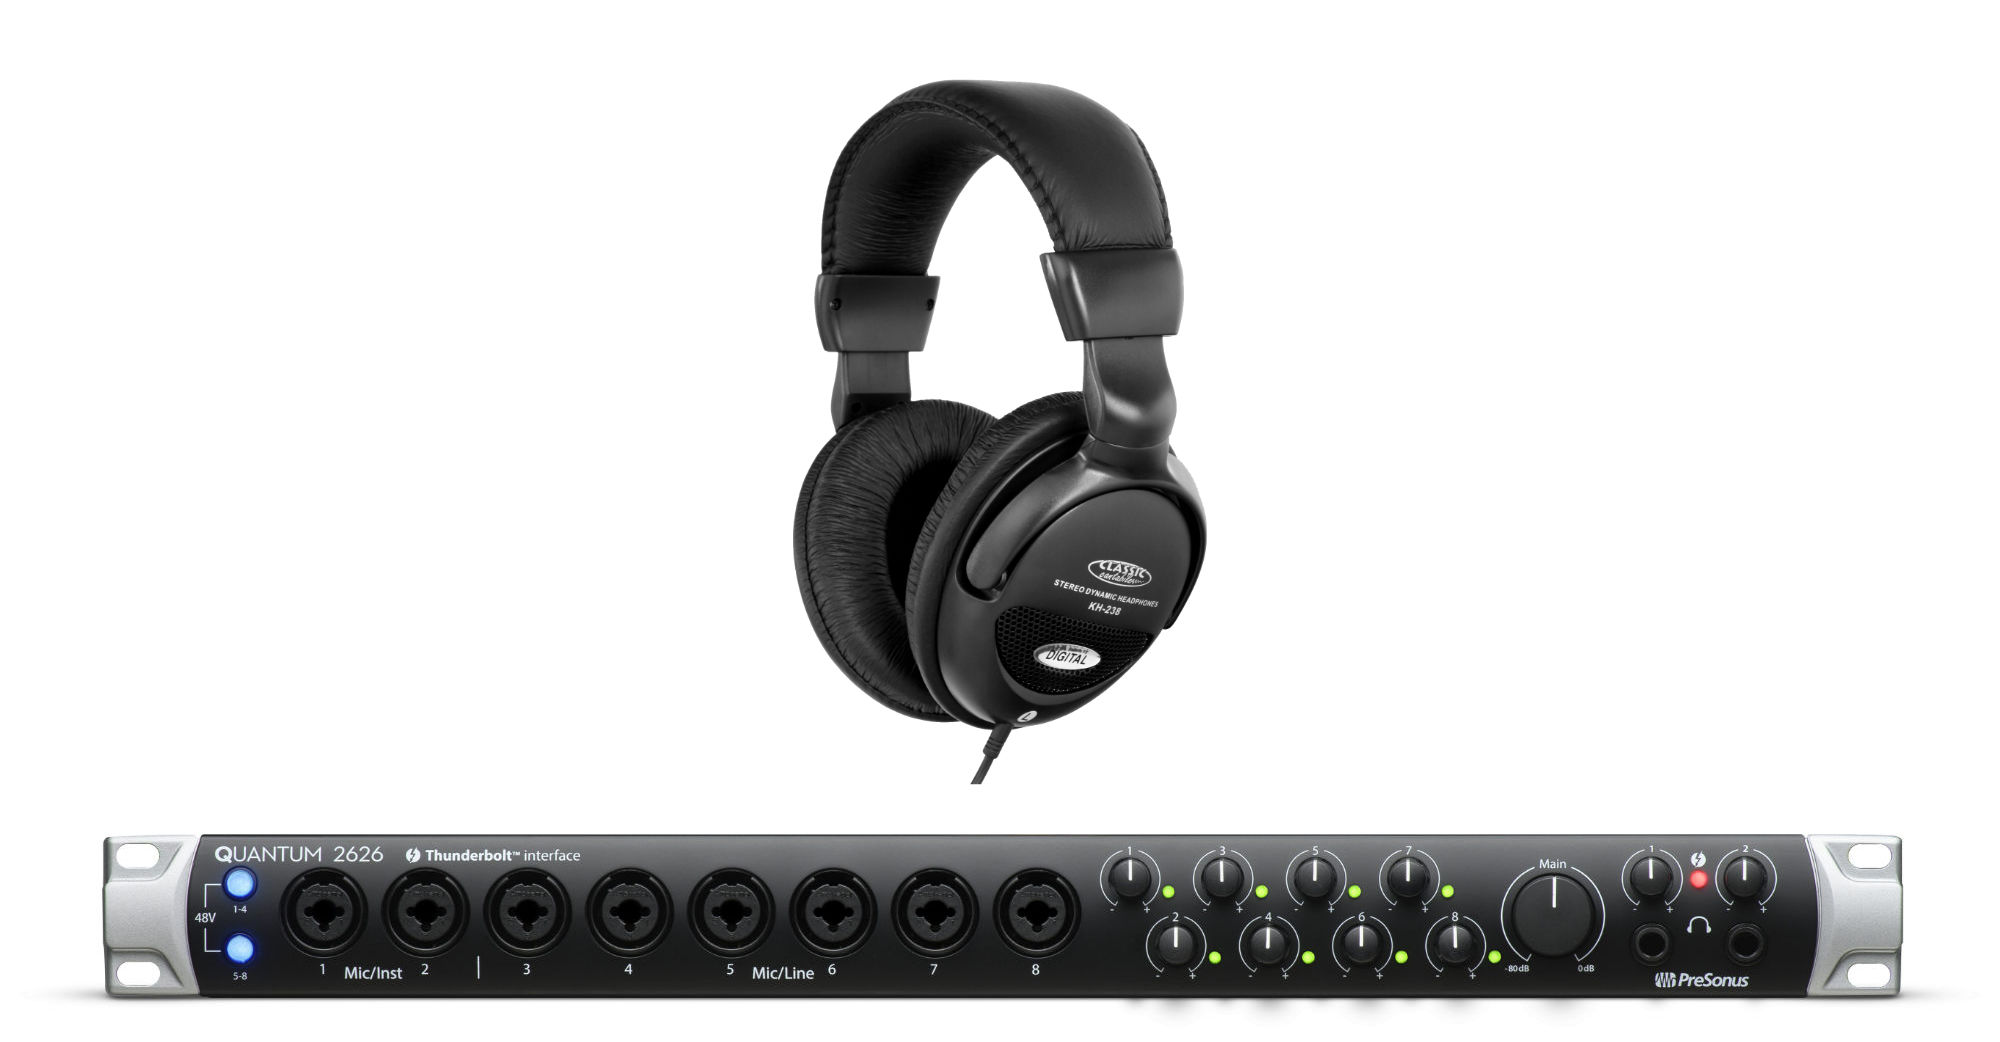 Pchardware - Presonus Quantum 2626 Audio Interface Set - Onlineshop Musikhaus Kirstein